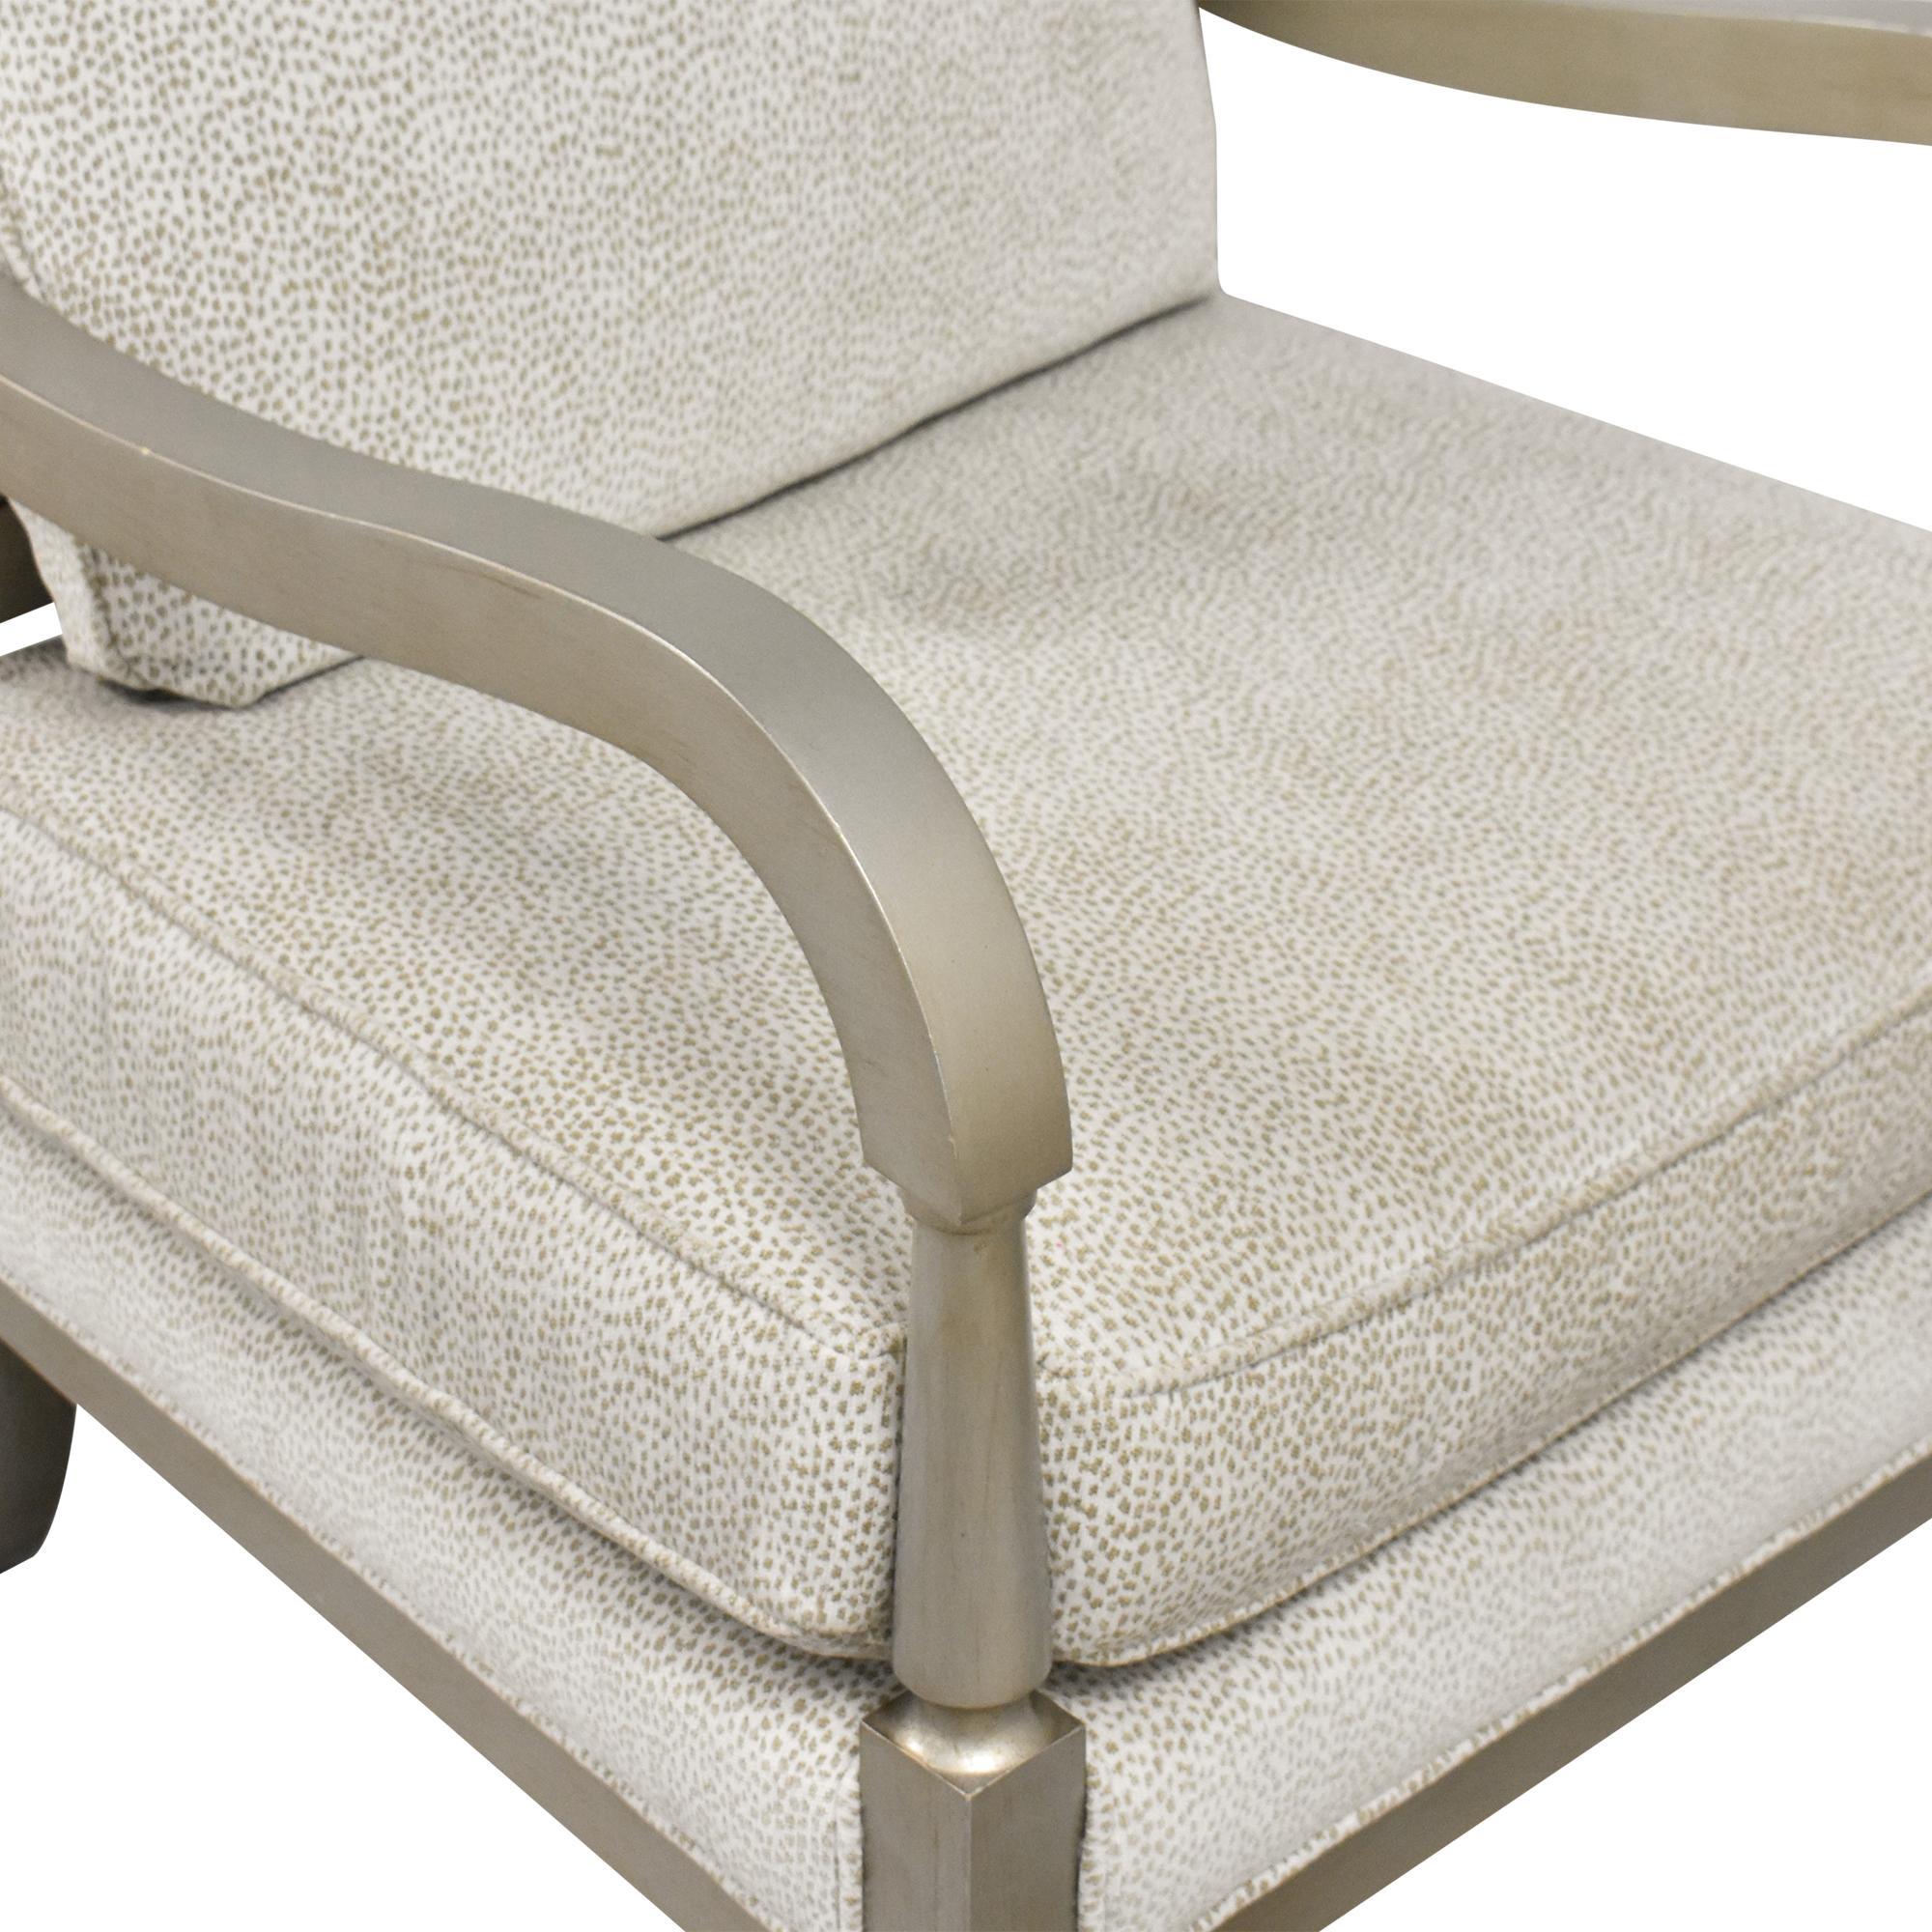 Vanguard Furniture Modern Accent Chair Vanguard Furniture